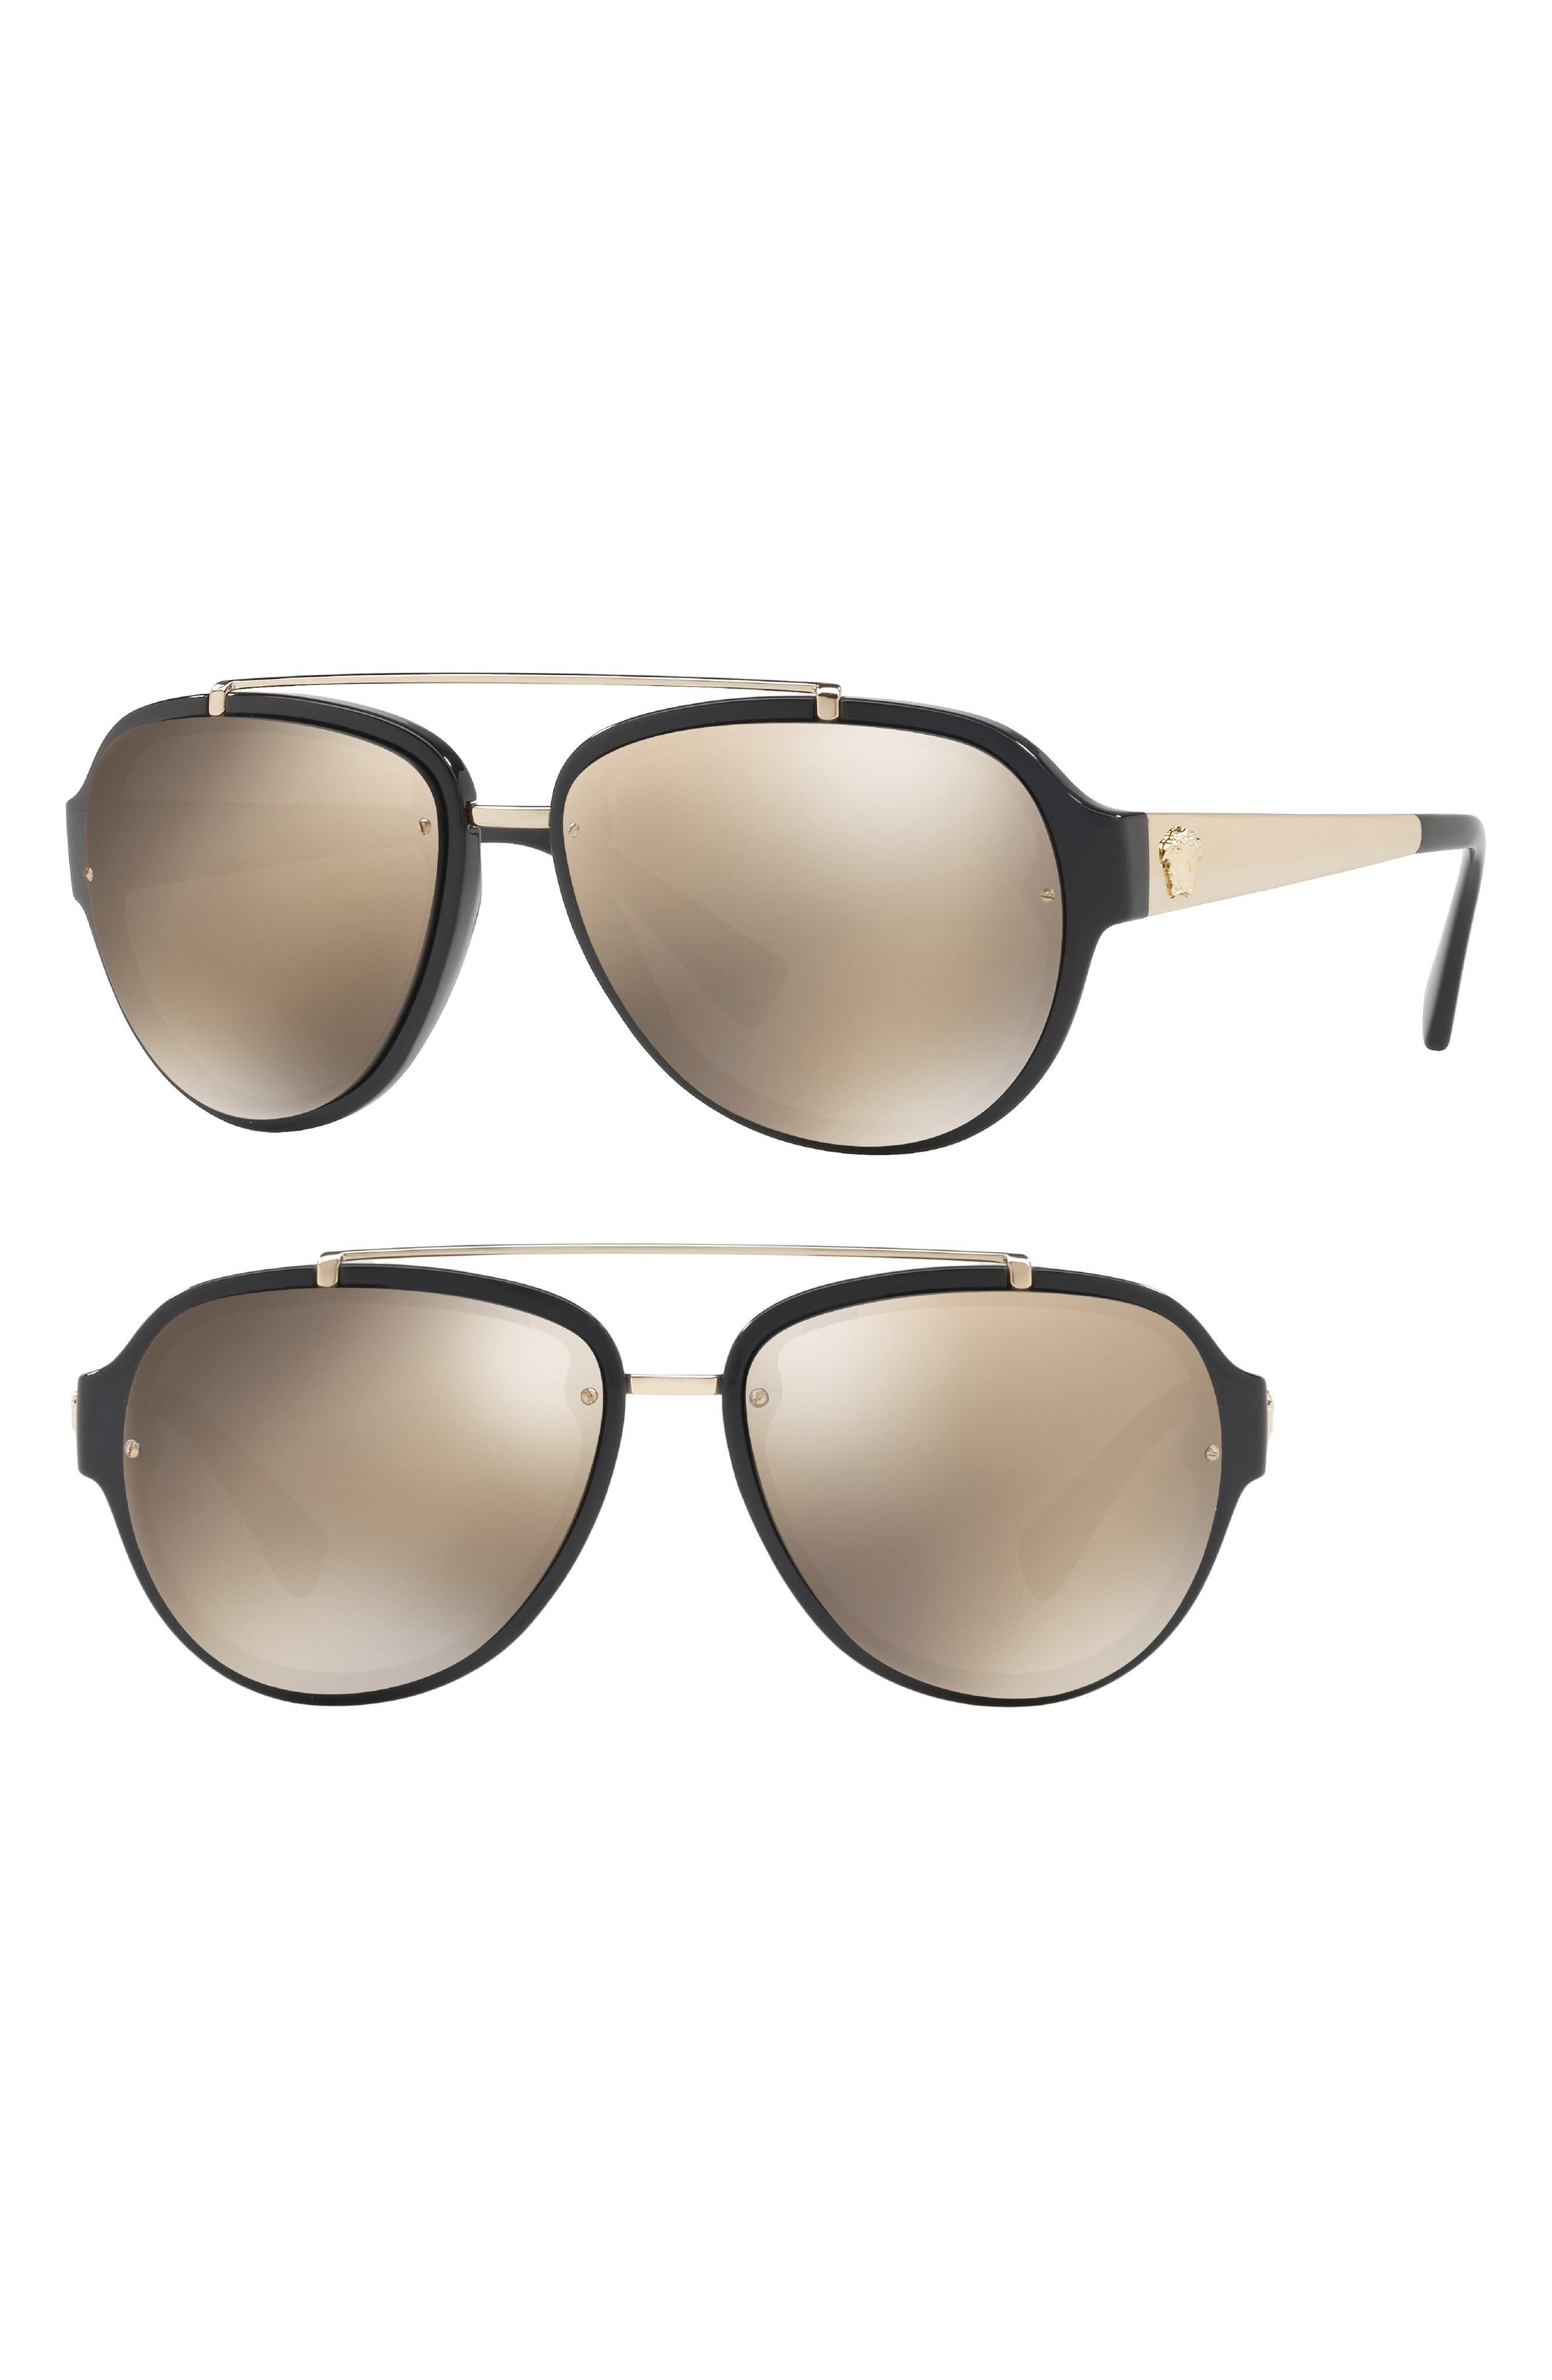 57mm Aviator Sunglasses,                             Alternate thumbnail 2, color,                             BLACK/ BROWN